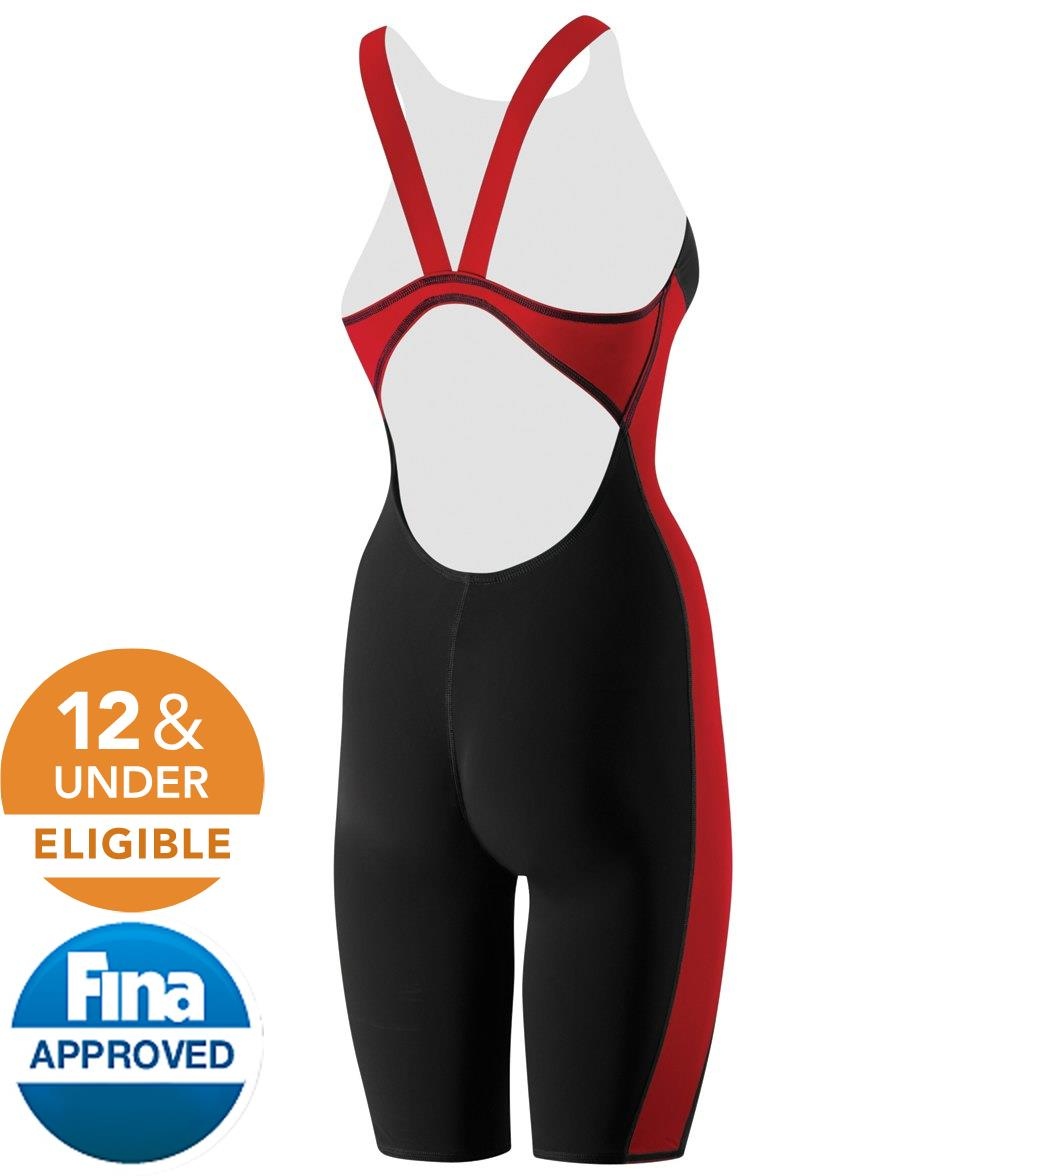 Speedo Women s Powerplus Kneeskin Tech Suit Swimsuit at SwimOutlet ... c365a91d2d